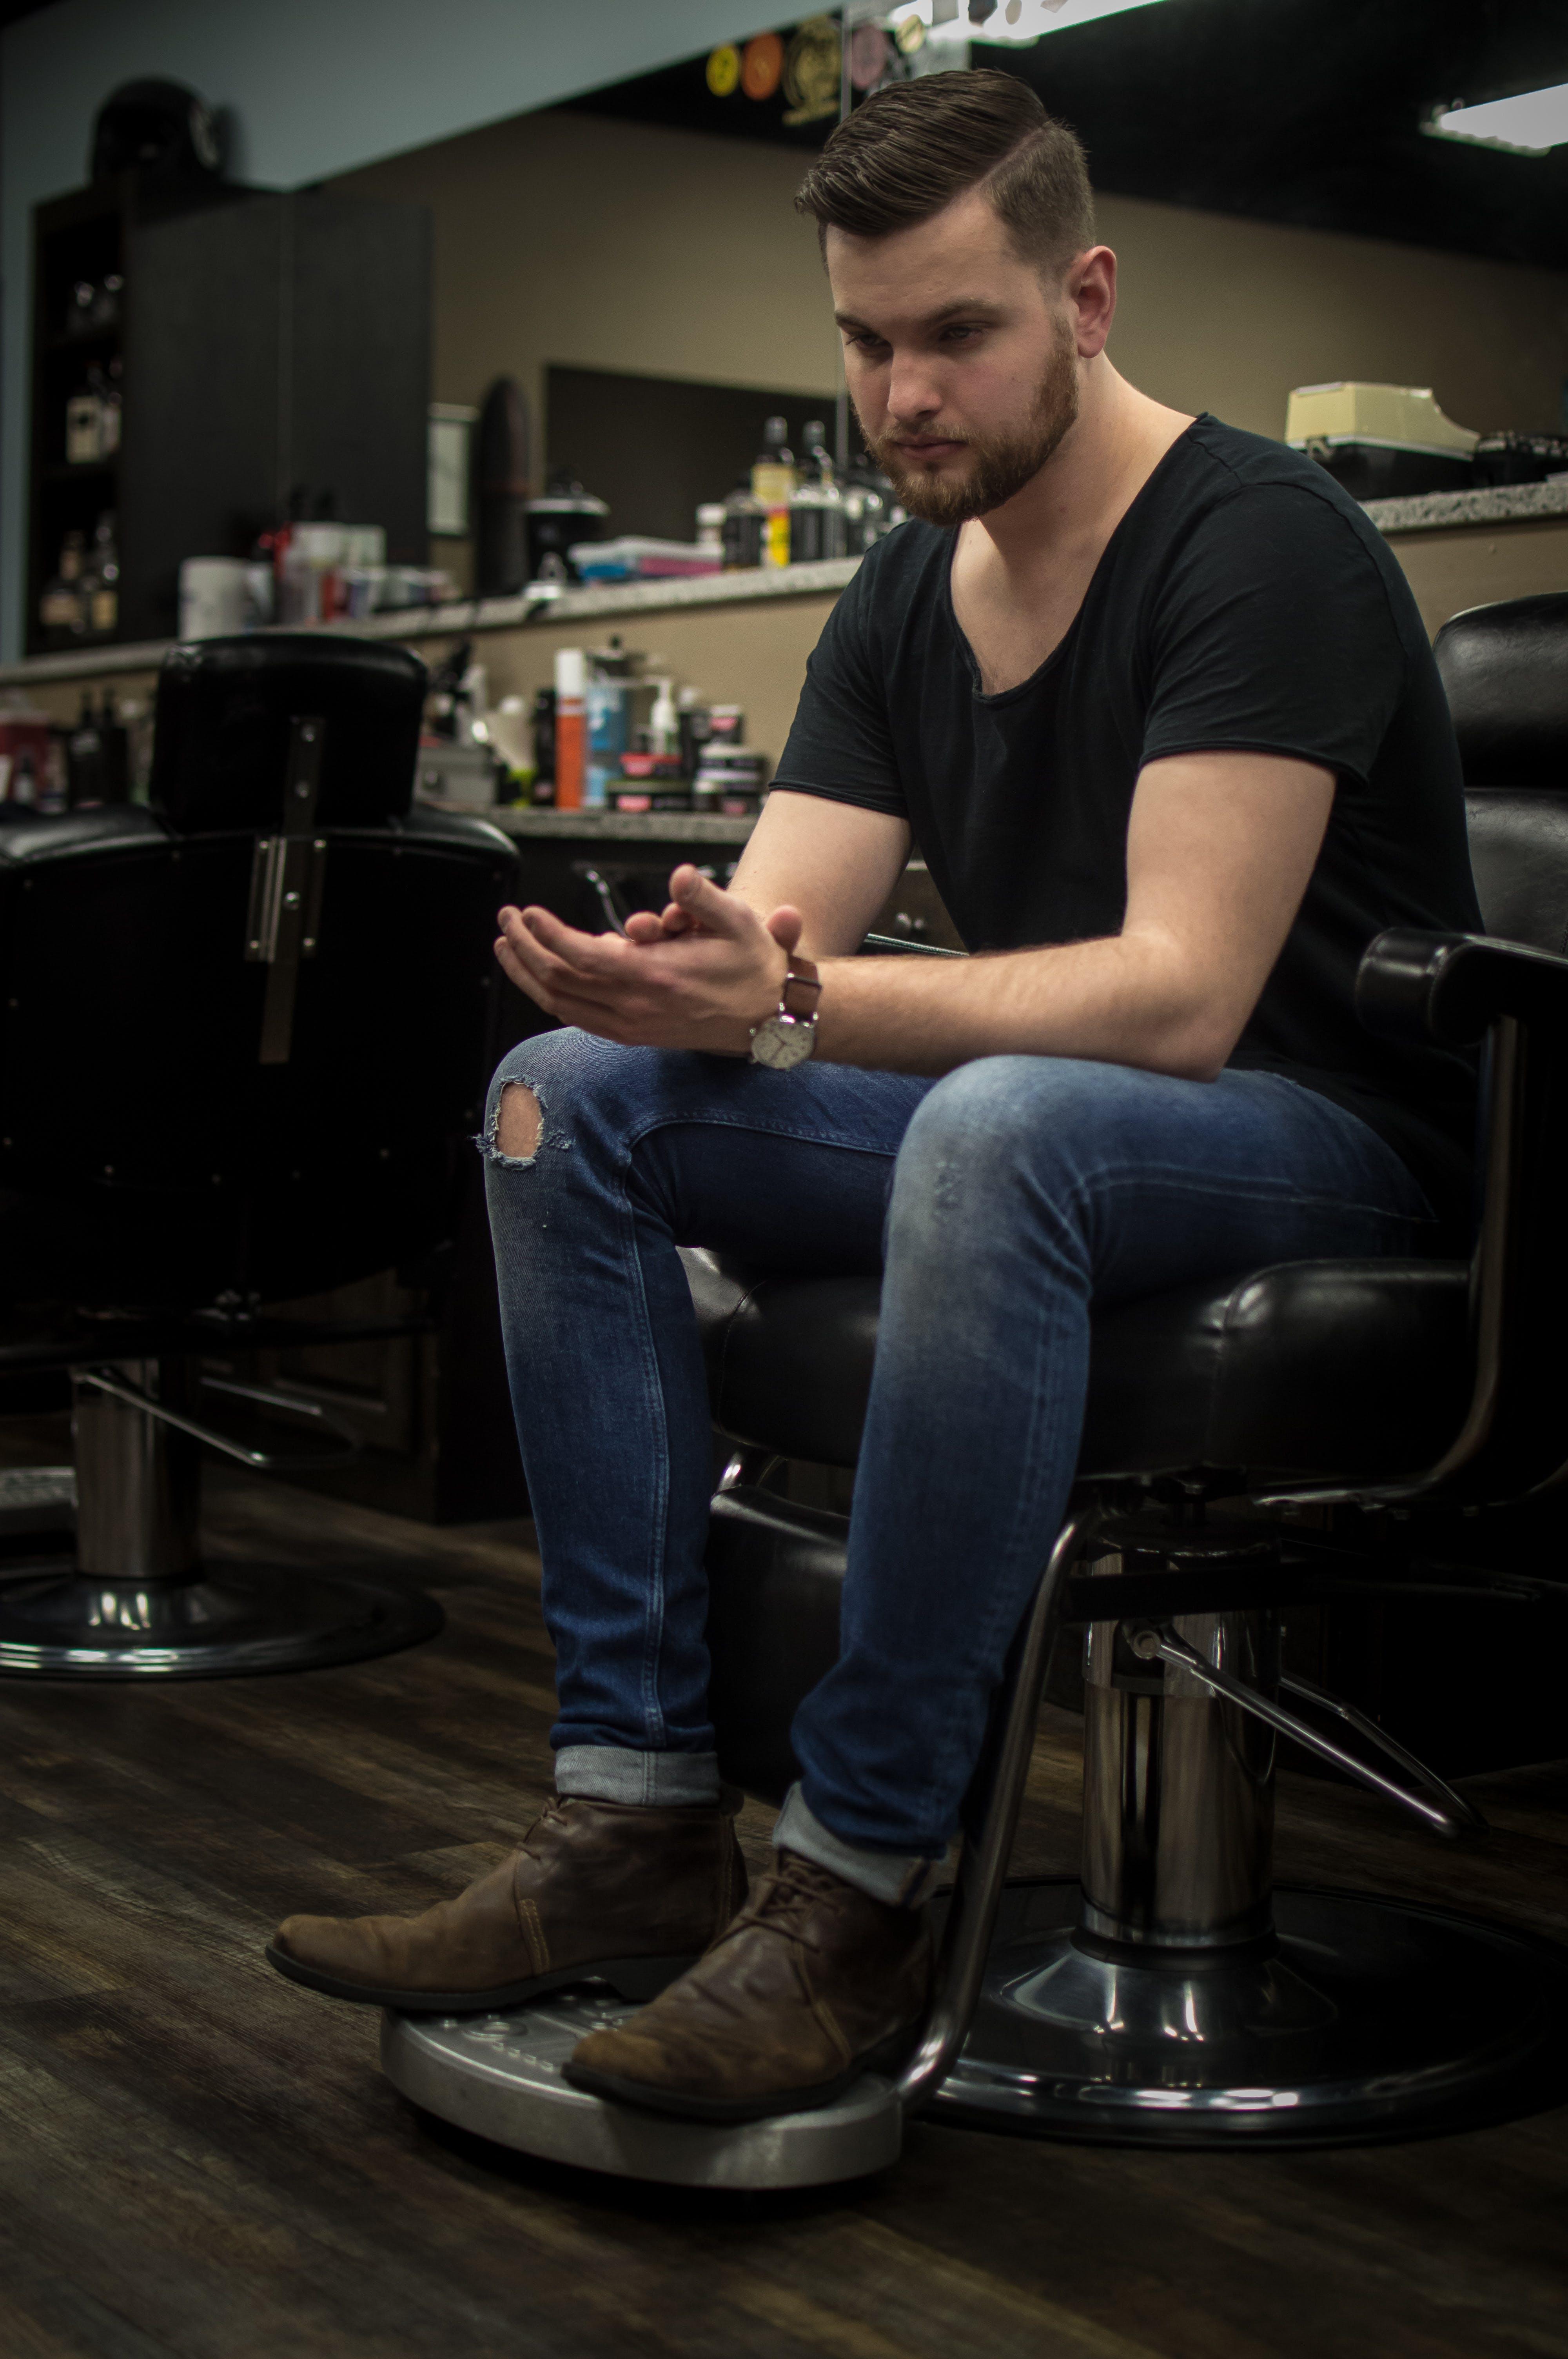 Free stock photo of barber, barbershop